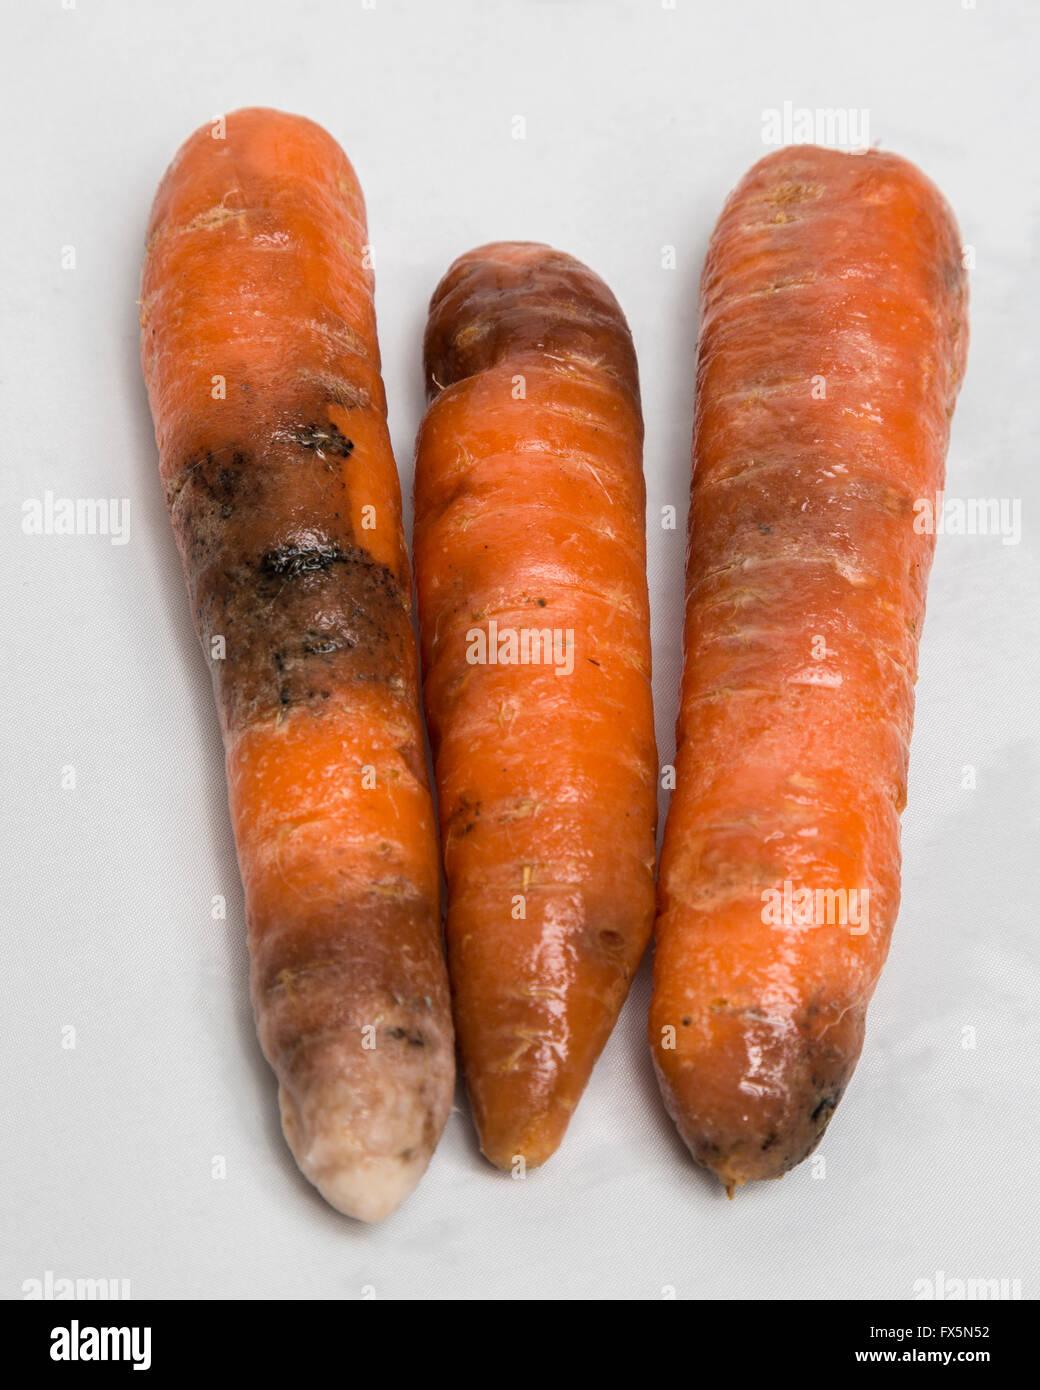 Black Carrots Food Poisoning